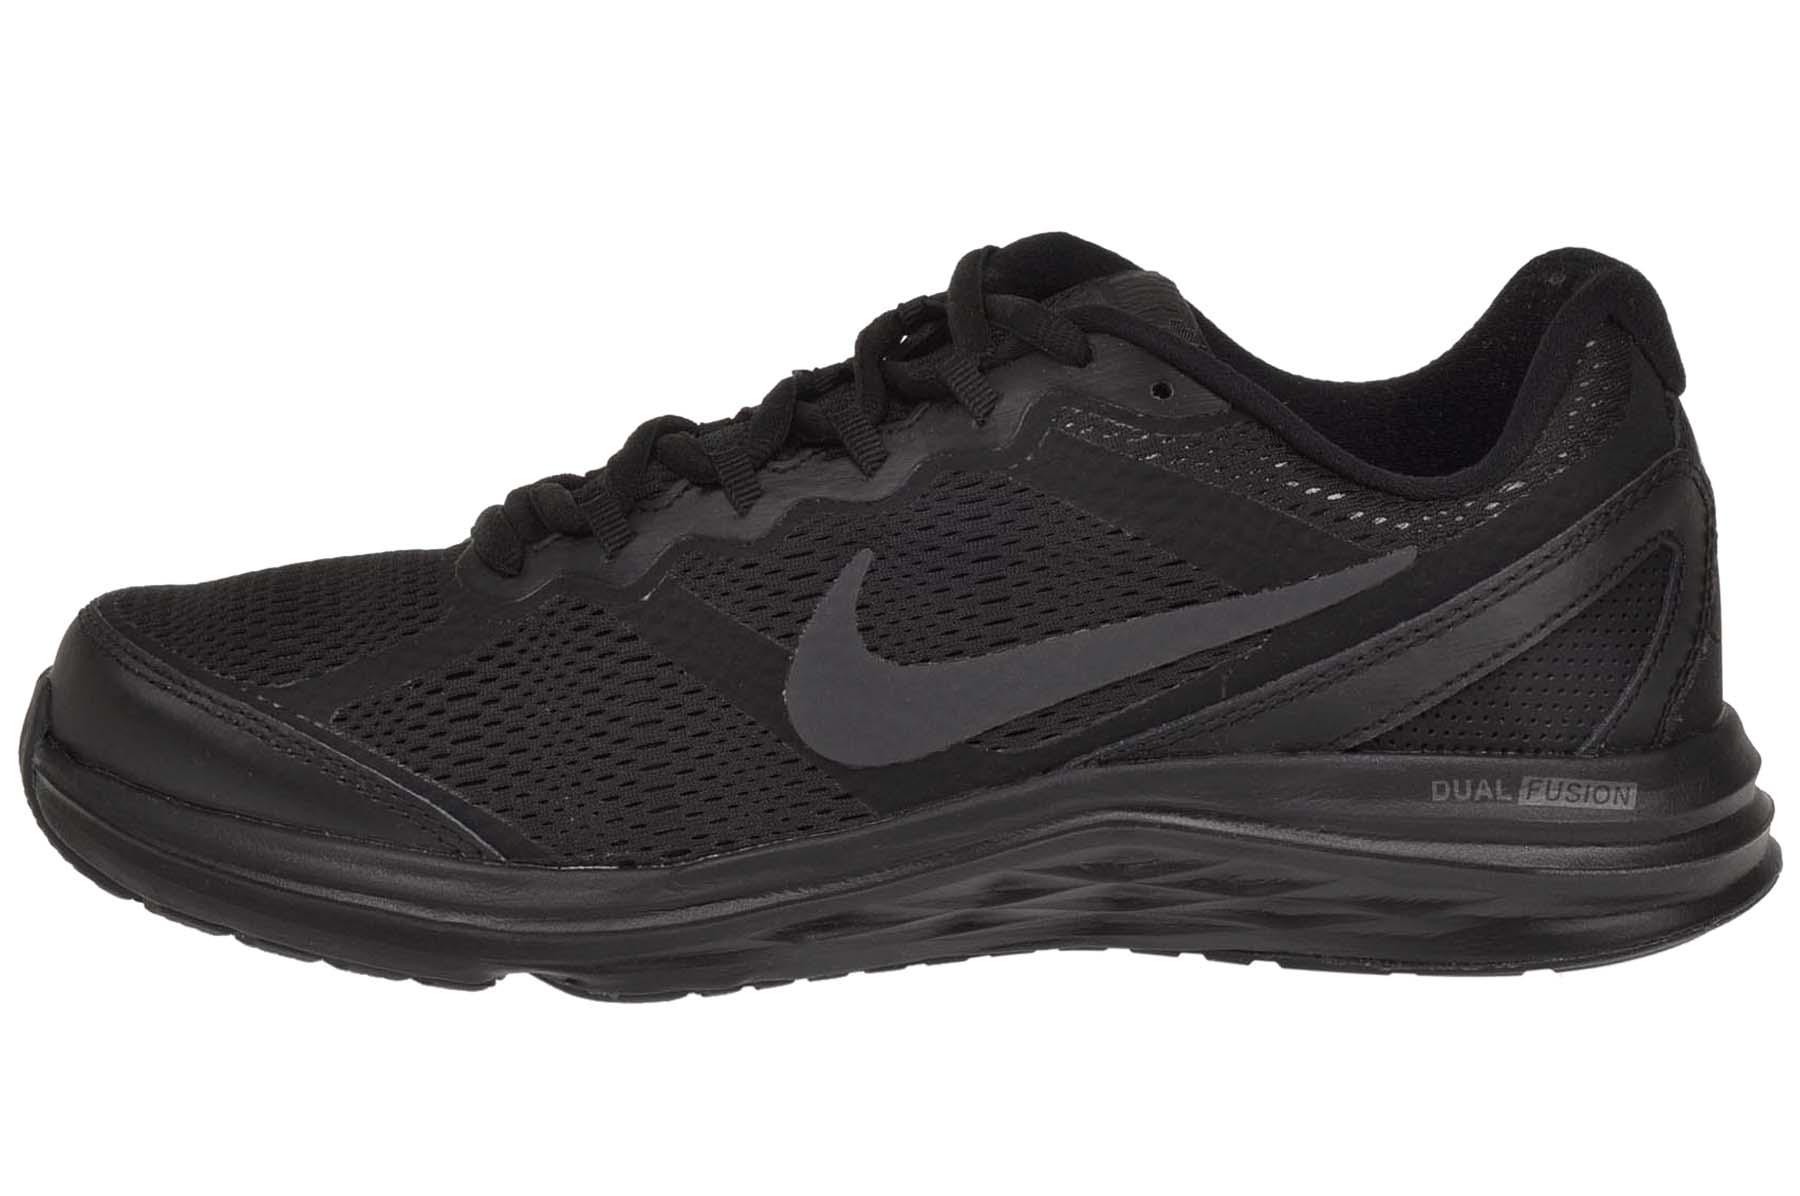 nike wmns dual fusion run 3 running womens shoes black 653594-020